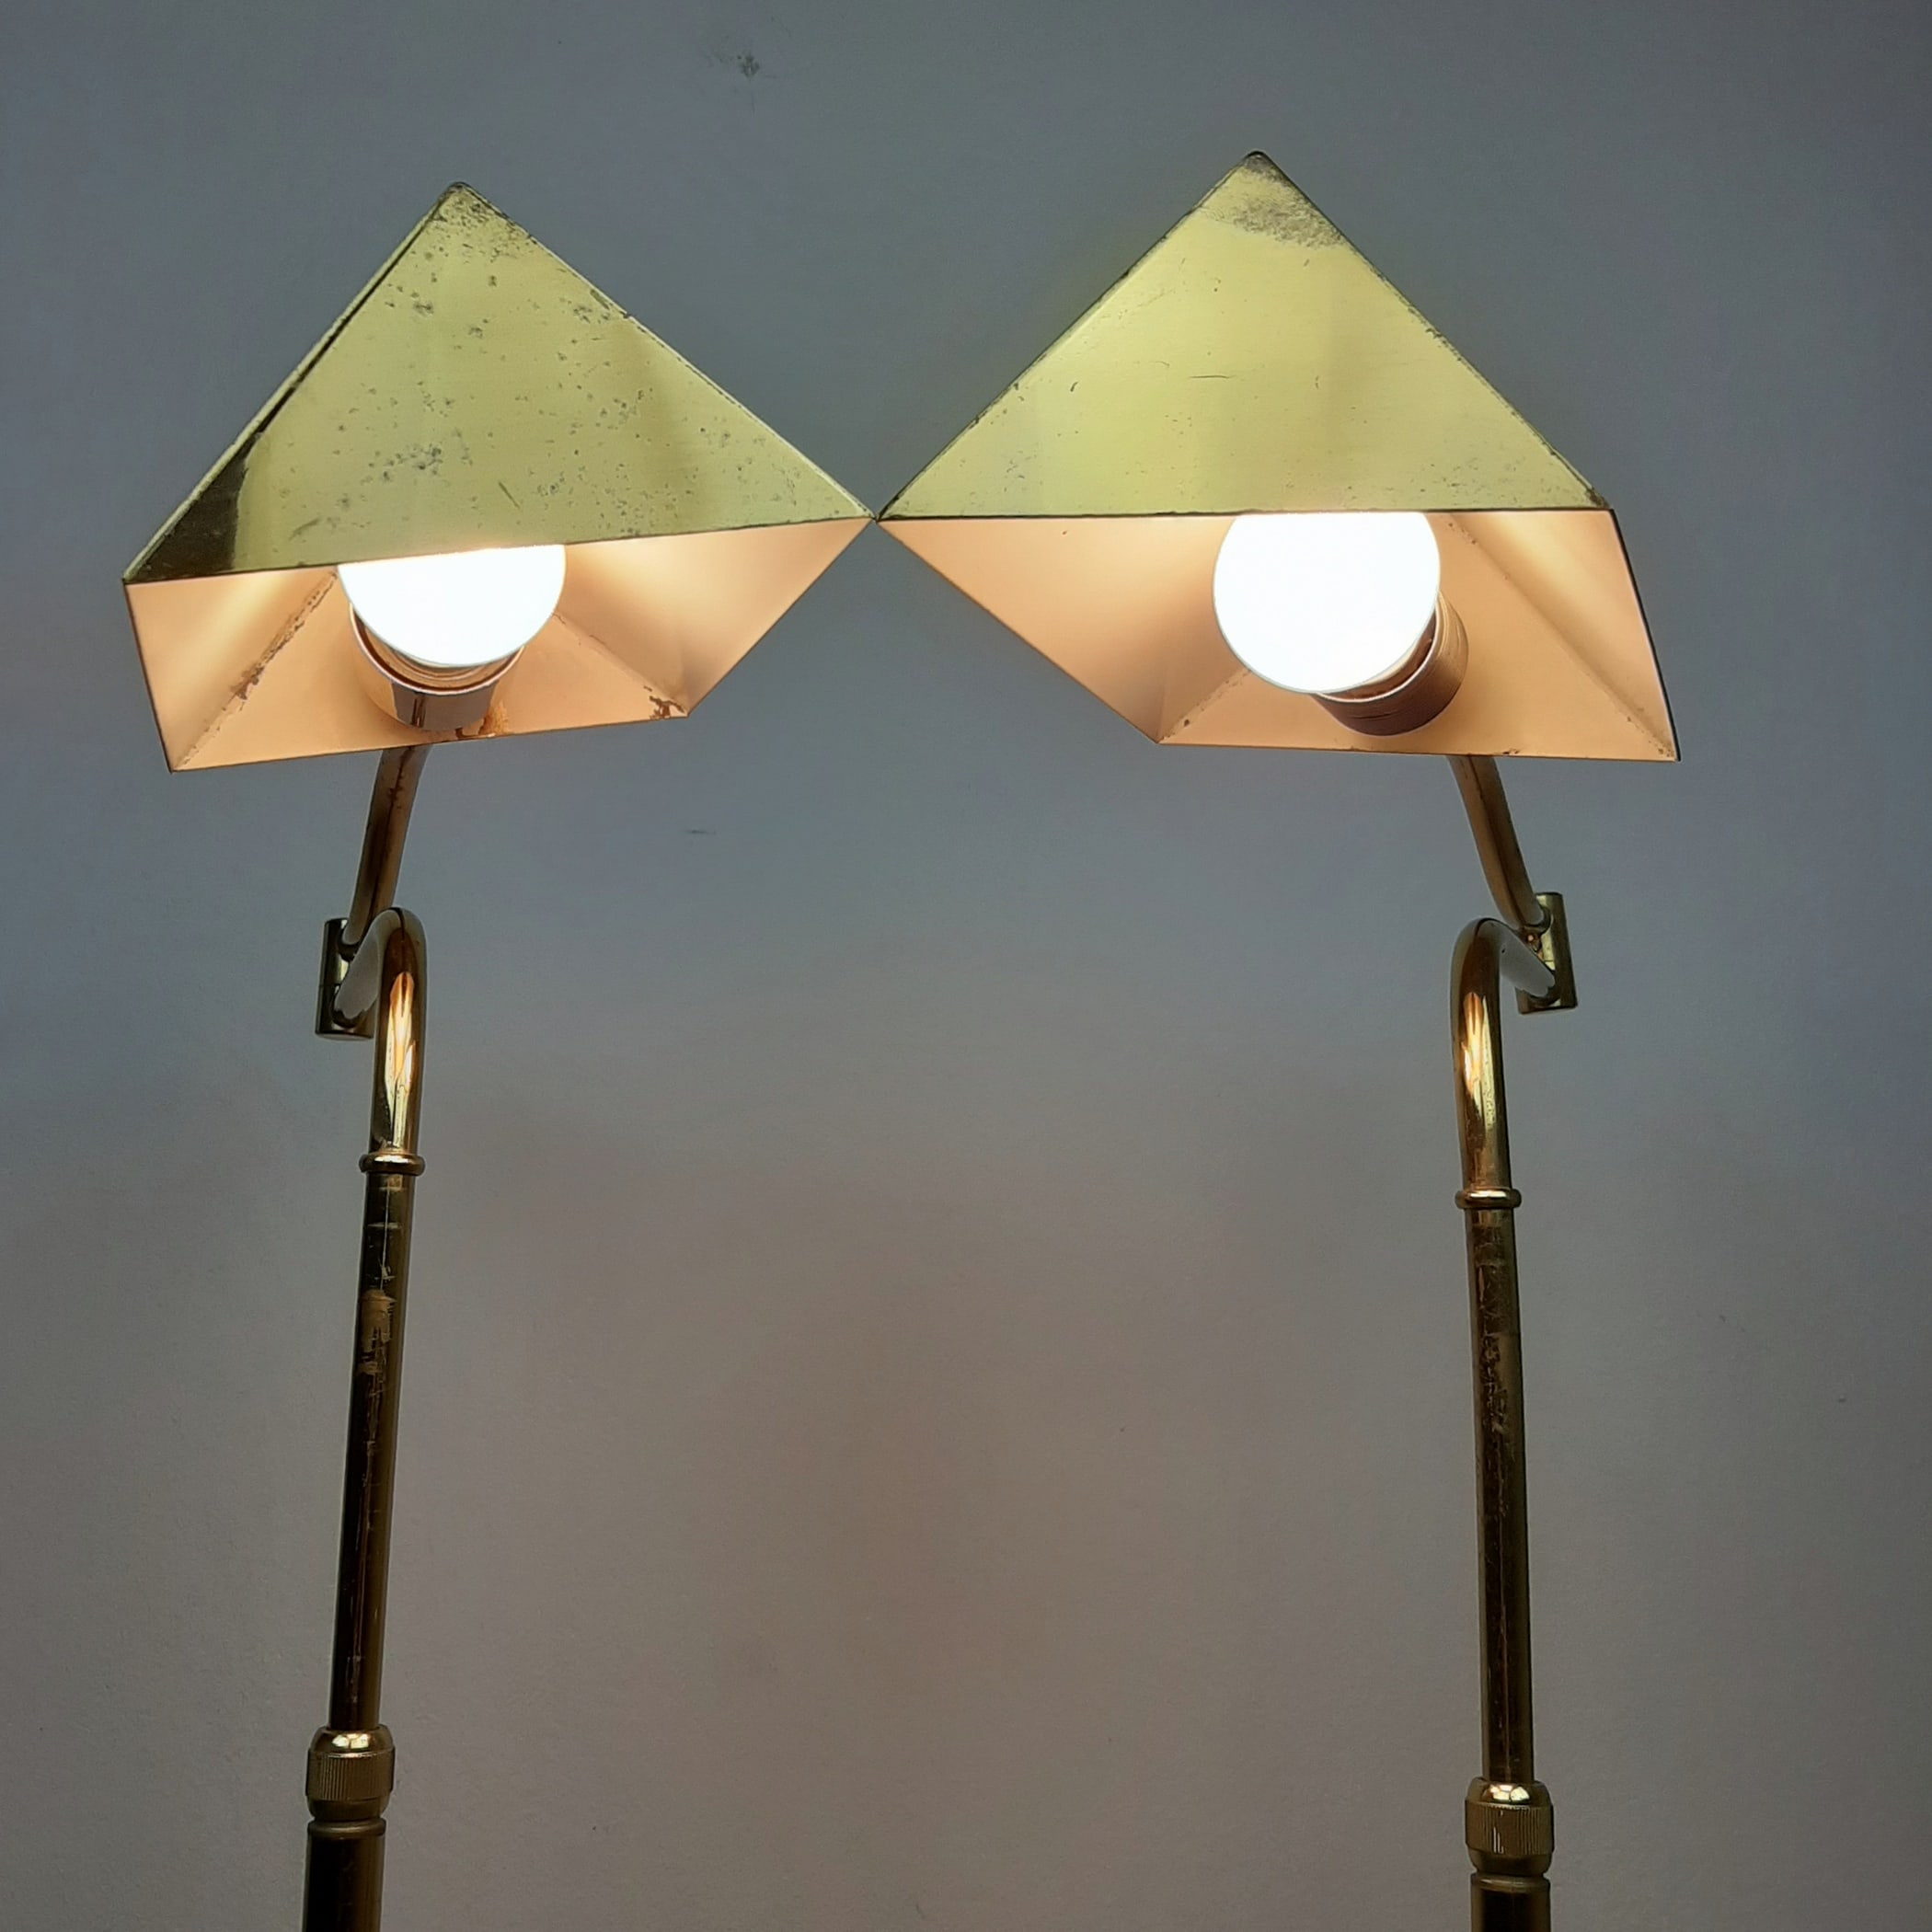 1 of 2 Mid-century brass floor lamp Germany 1970s Retro Modern Adjustable Brass Floor Lamp Style by Florian Schulz